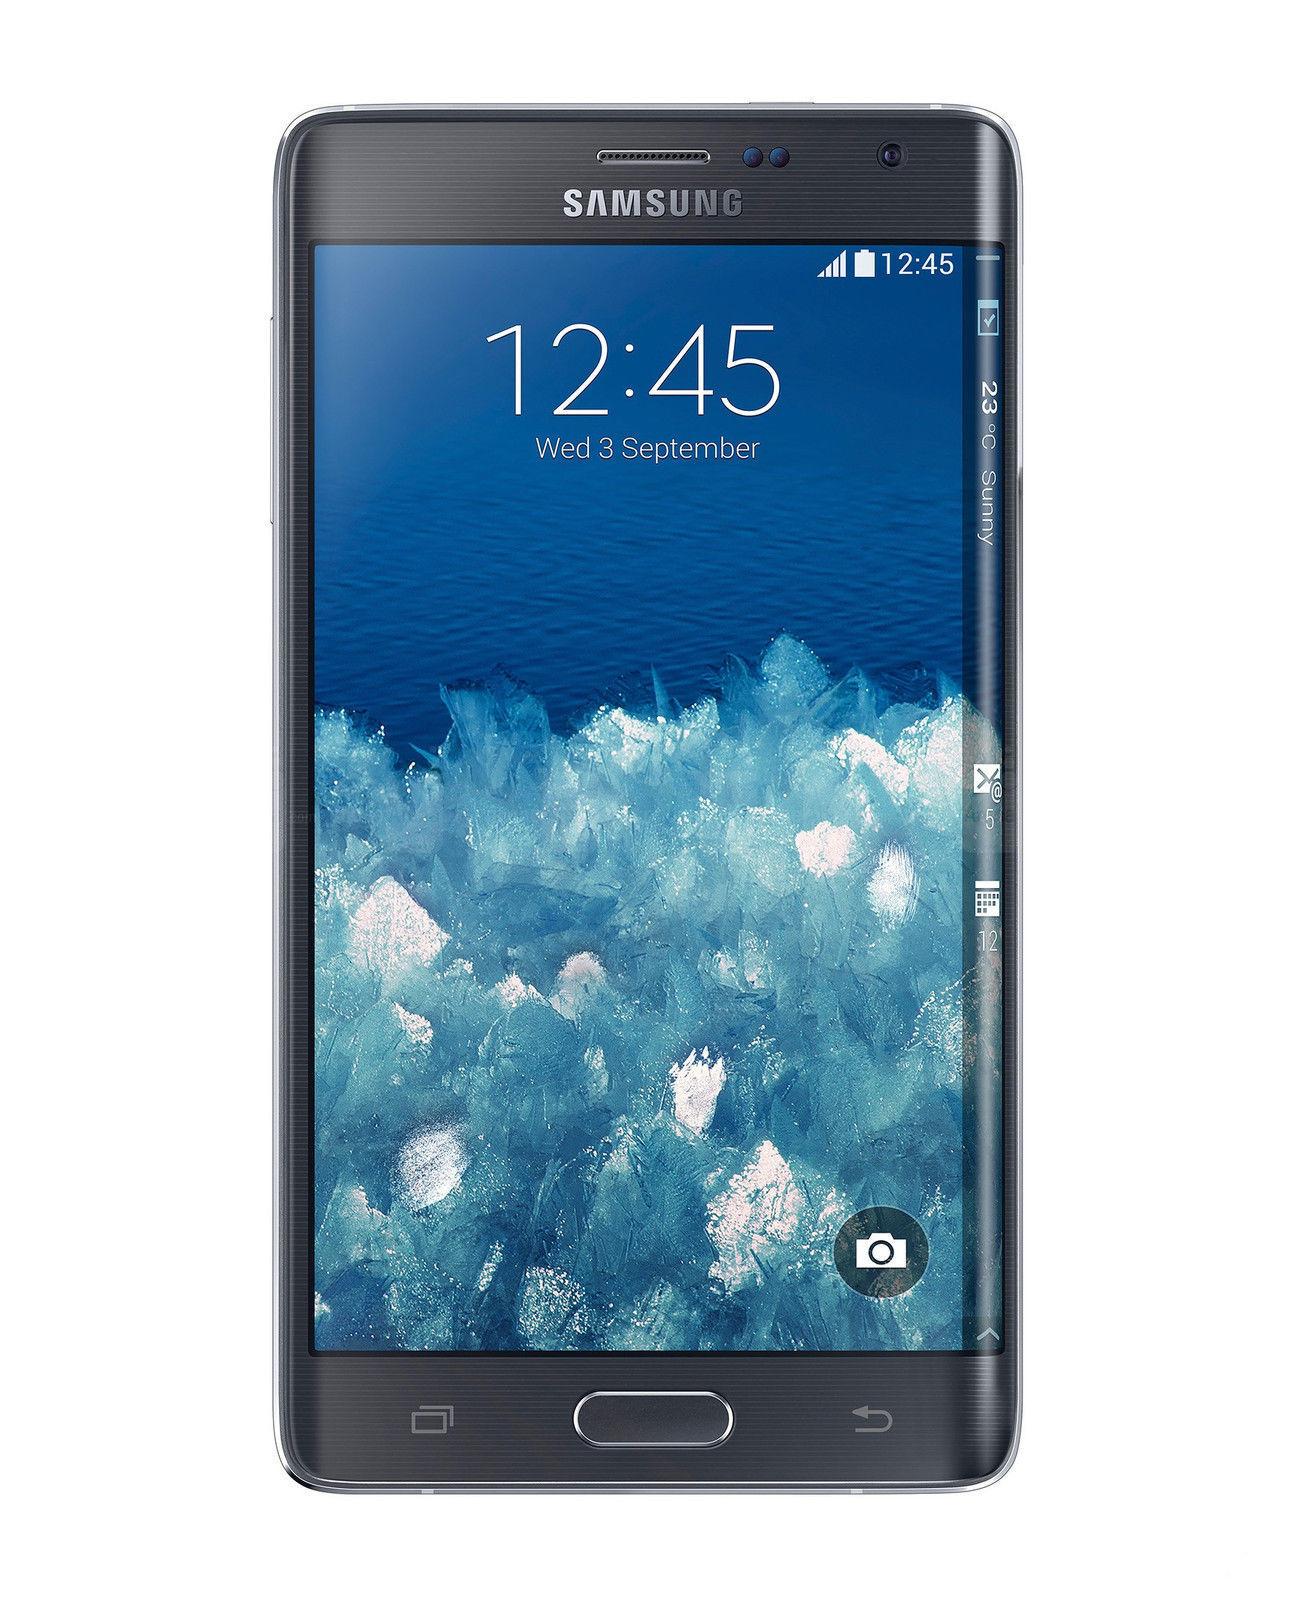 Samsung Galaxy Note Edge SM-N915A - 32GB - Charcoal Black (AT&T) Smartphone